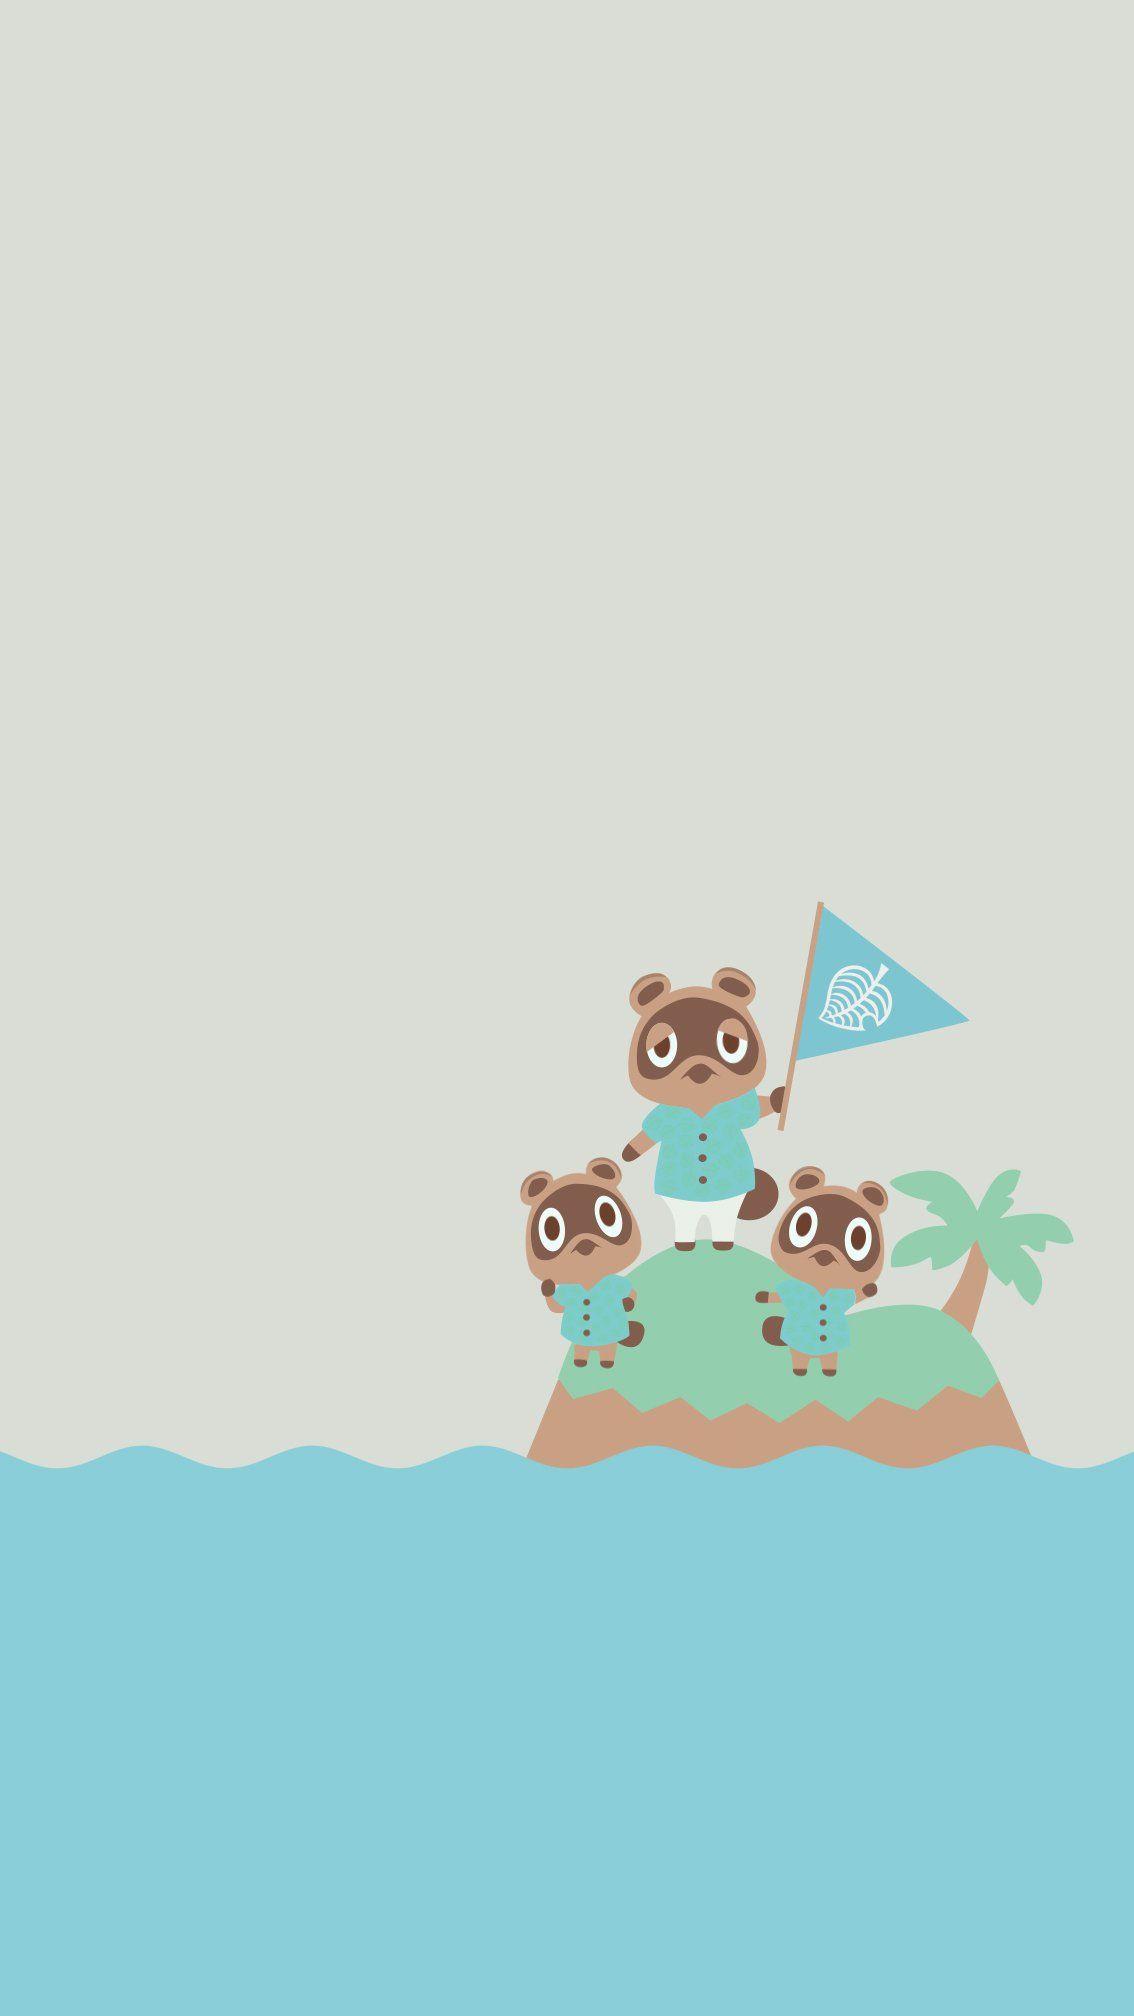 Celine Ga Pinned On Twitter Animal Crossing Fan Art Animal Crossing Game Animal Crossing Memes